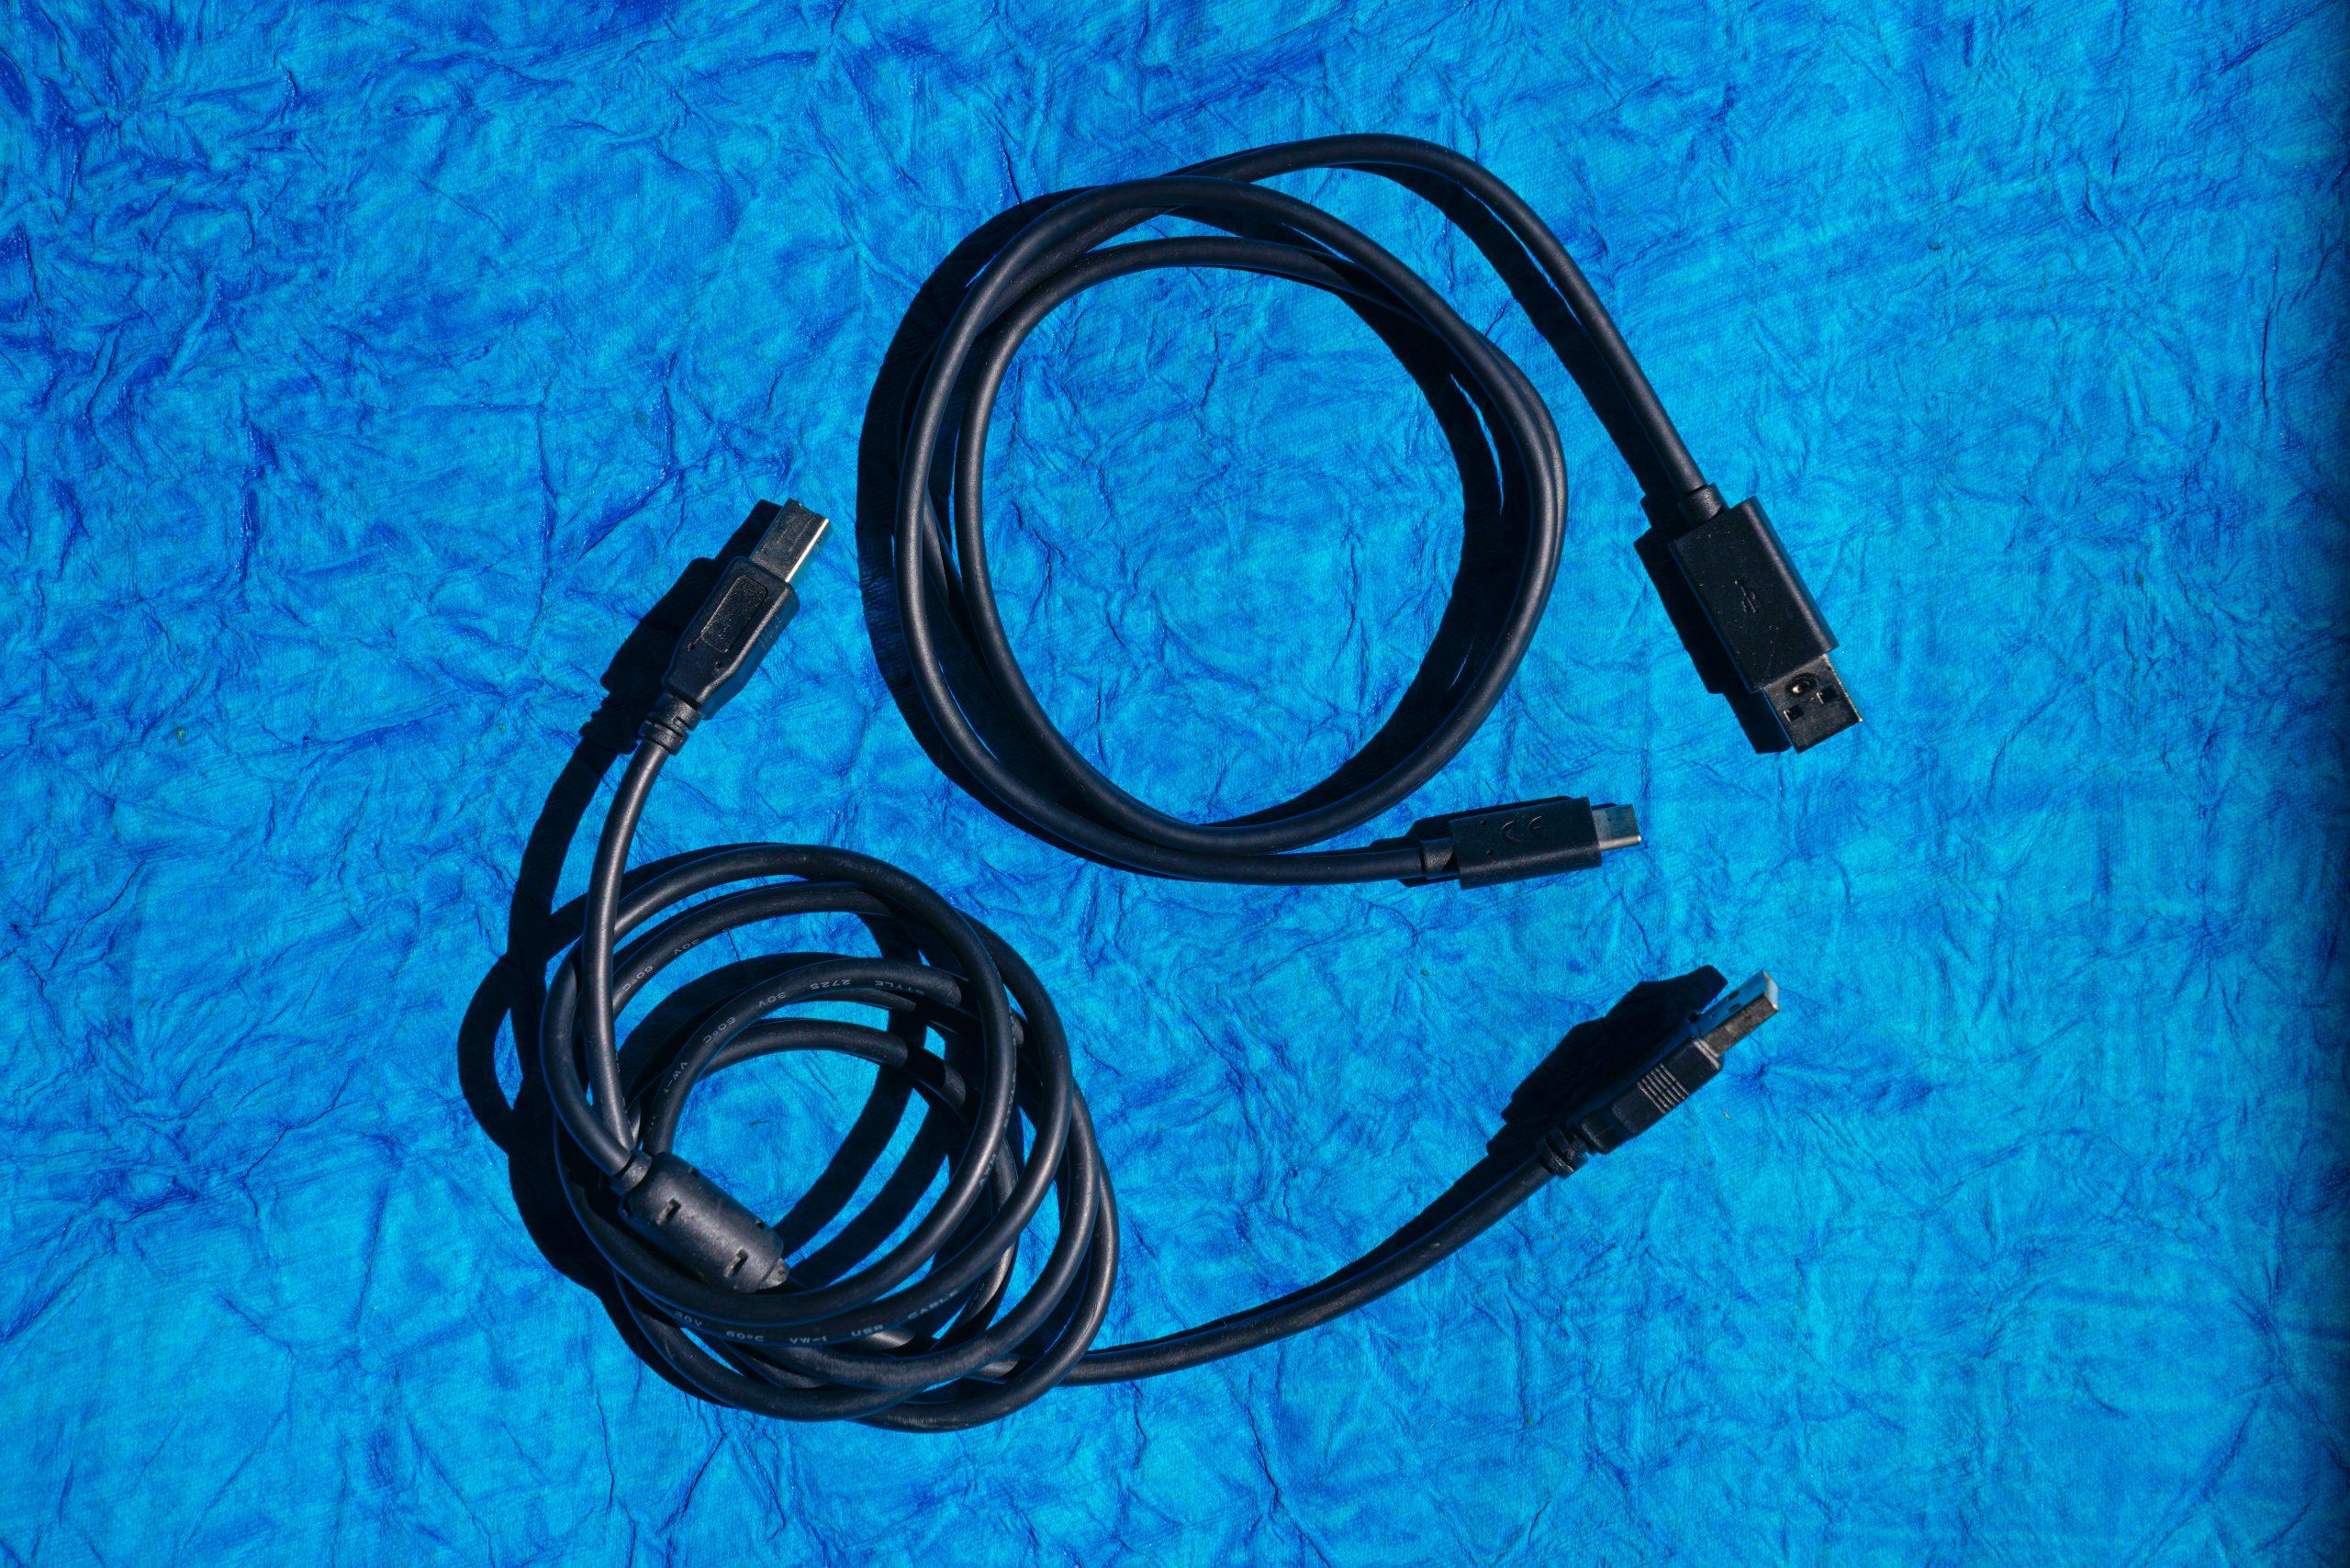 HDMI data cables